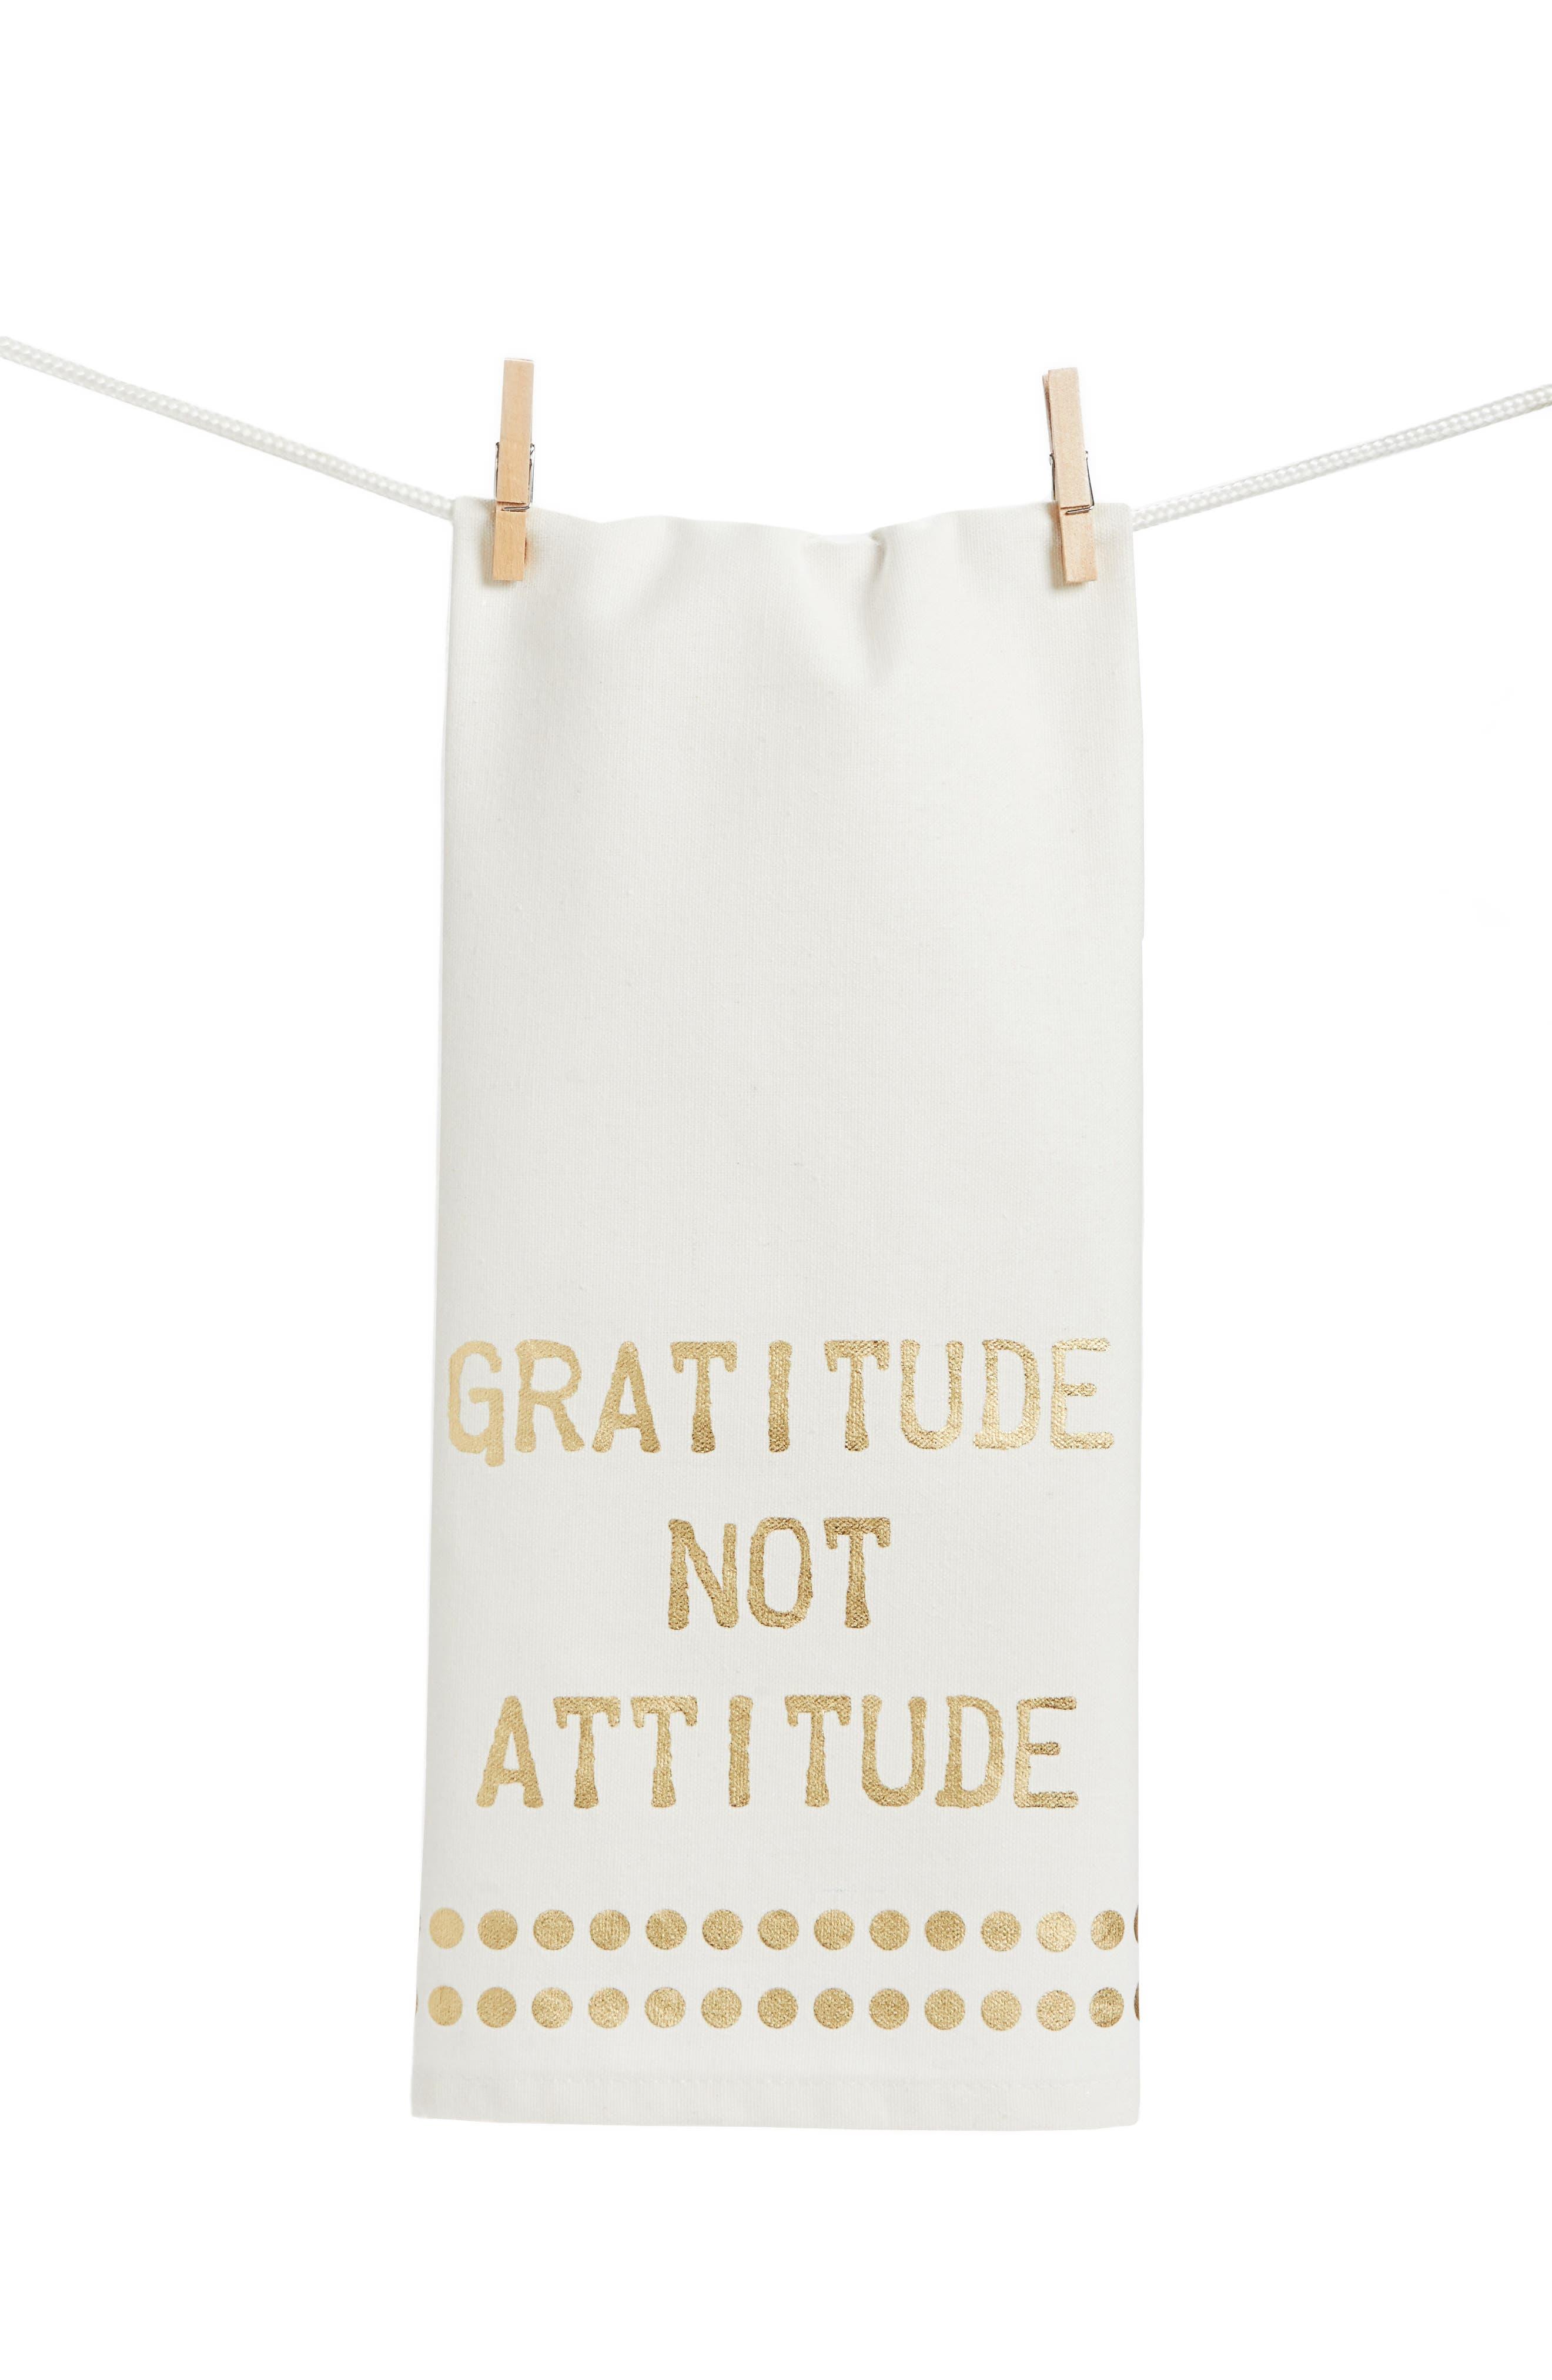 Gratitude Not Attitude Set of 2 Dish Towels,                             Main thumbnail 1, color,                             710